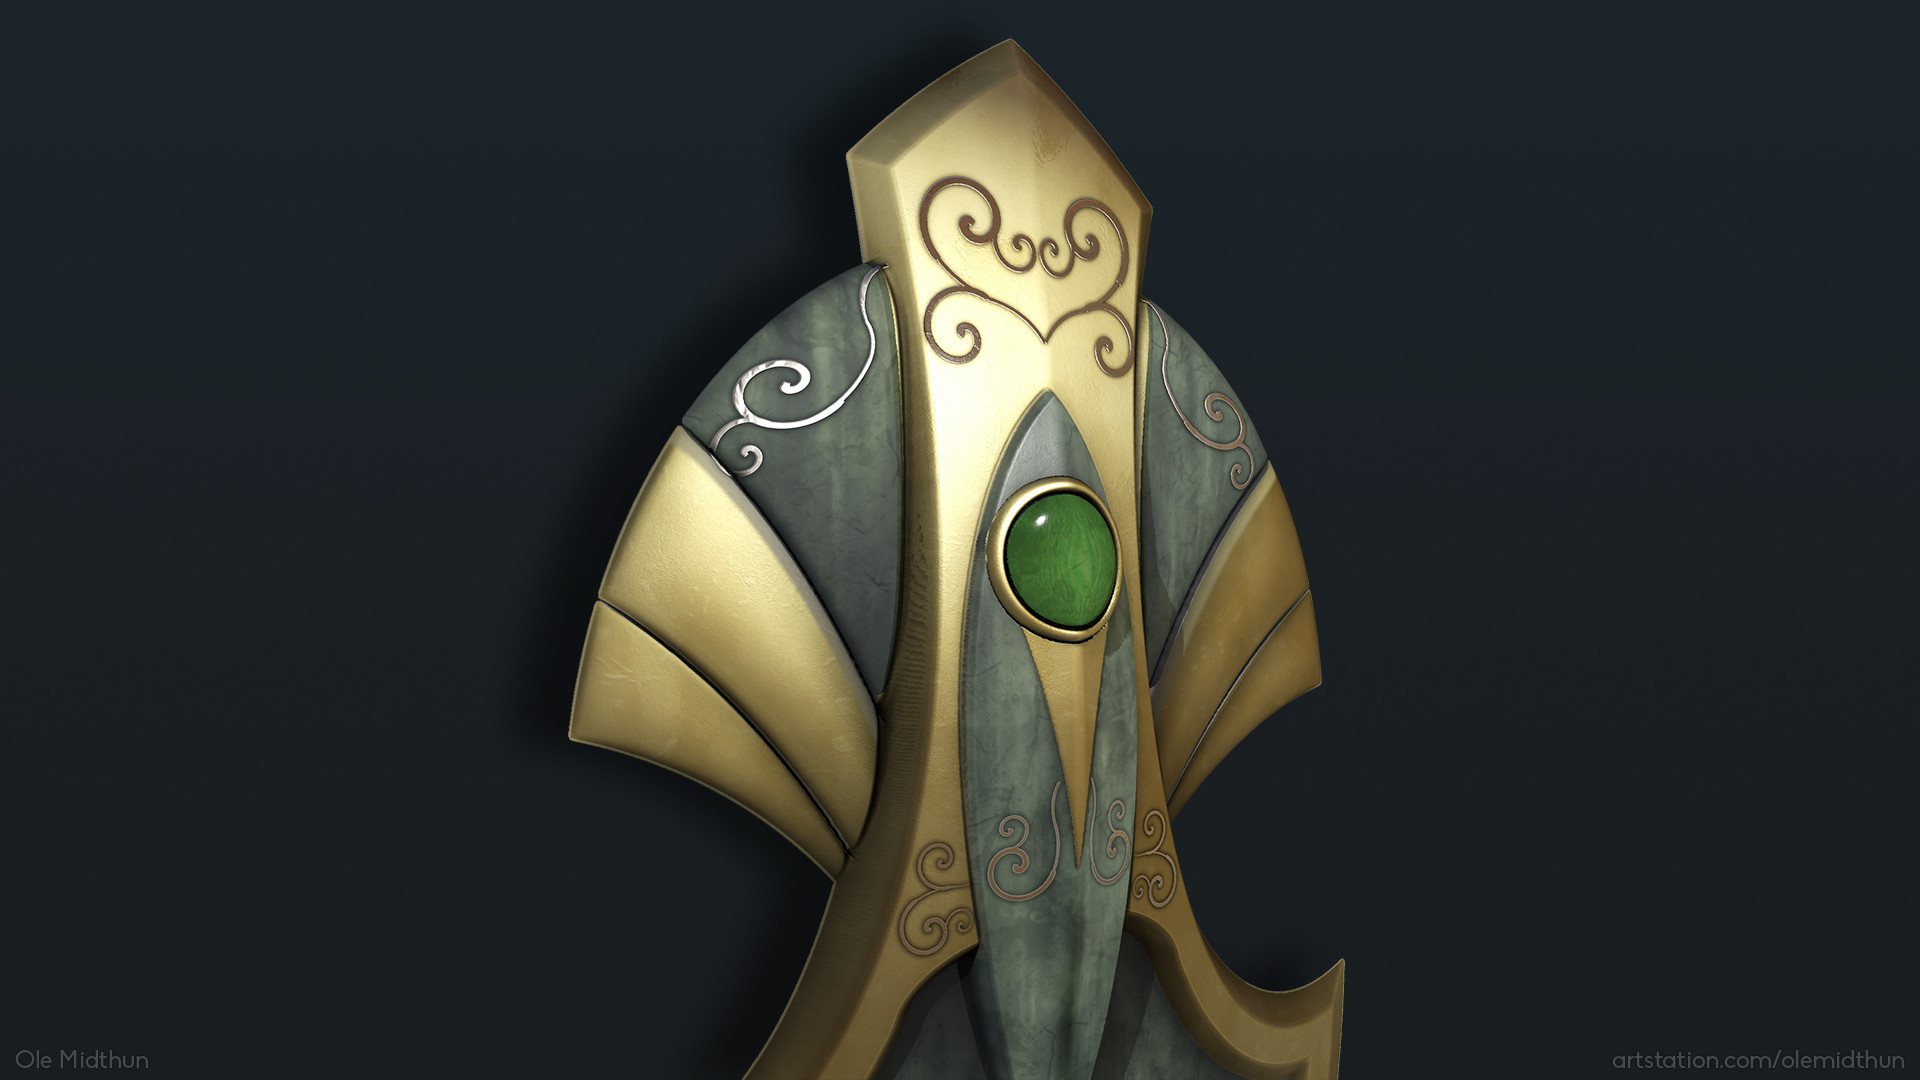 Ole midthun elven shield 3